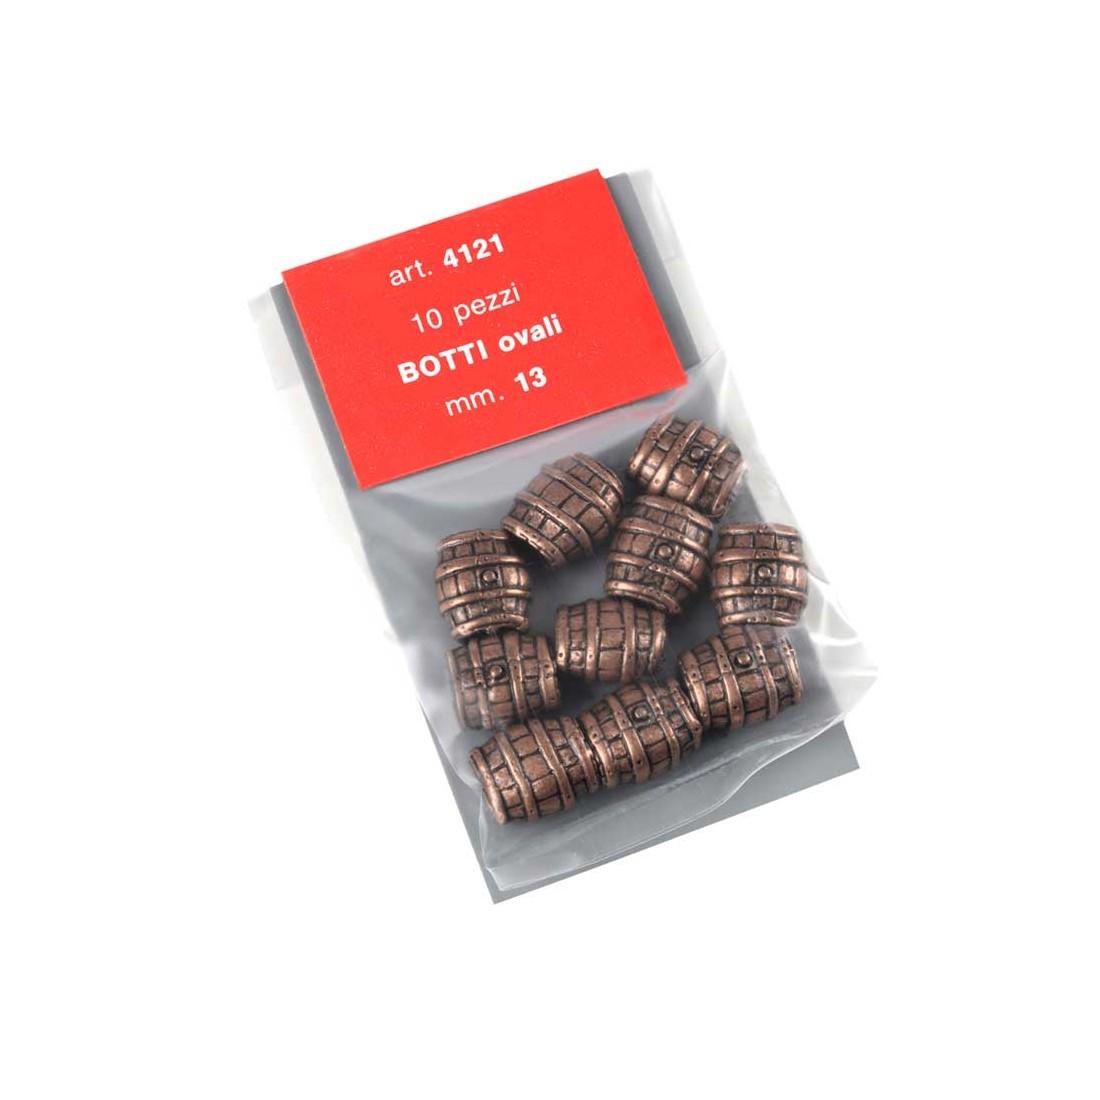 Barriles ovalados de metal mm.13